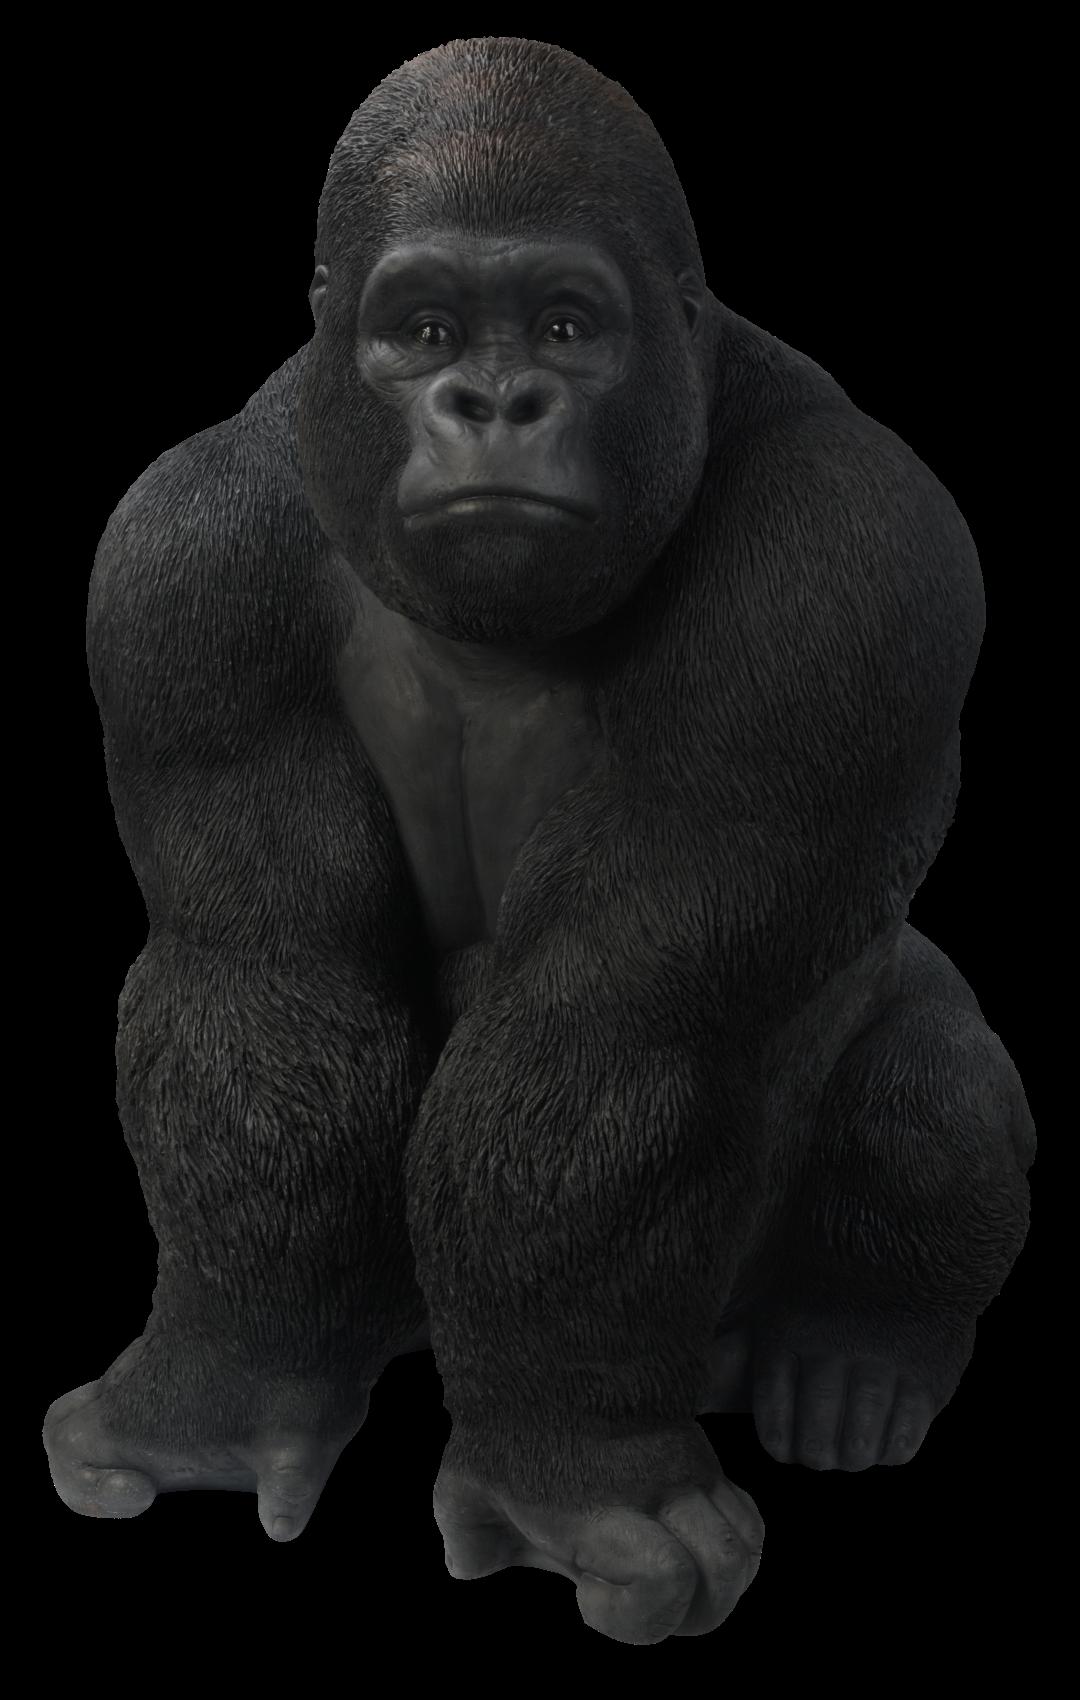 Gorilla PNG images free download, gorillas PNG.